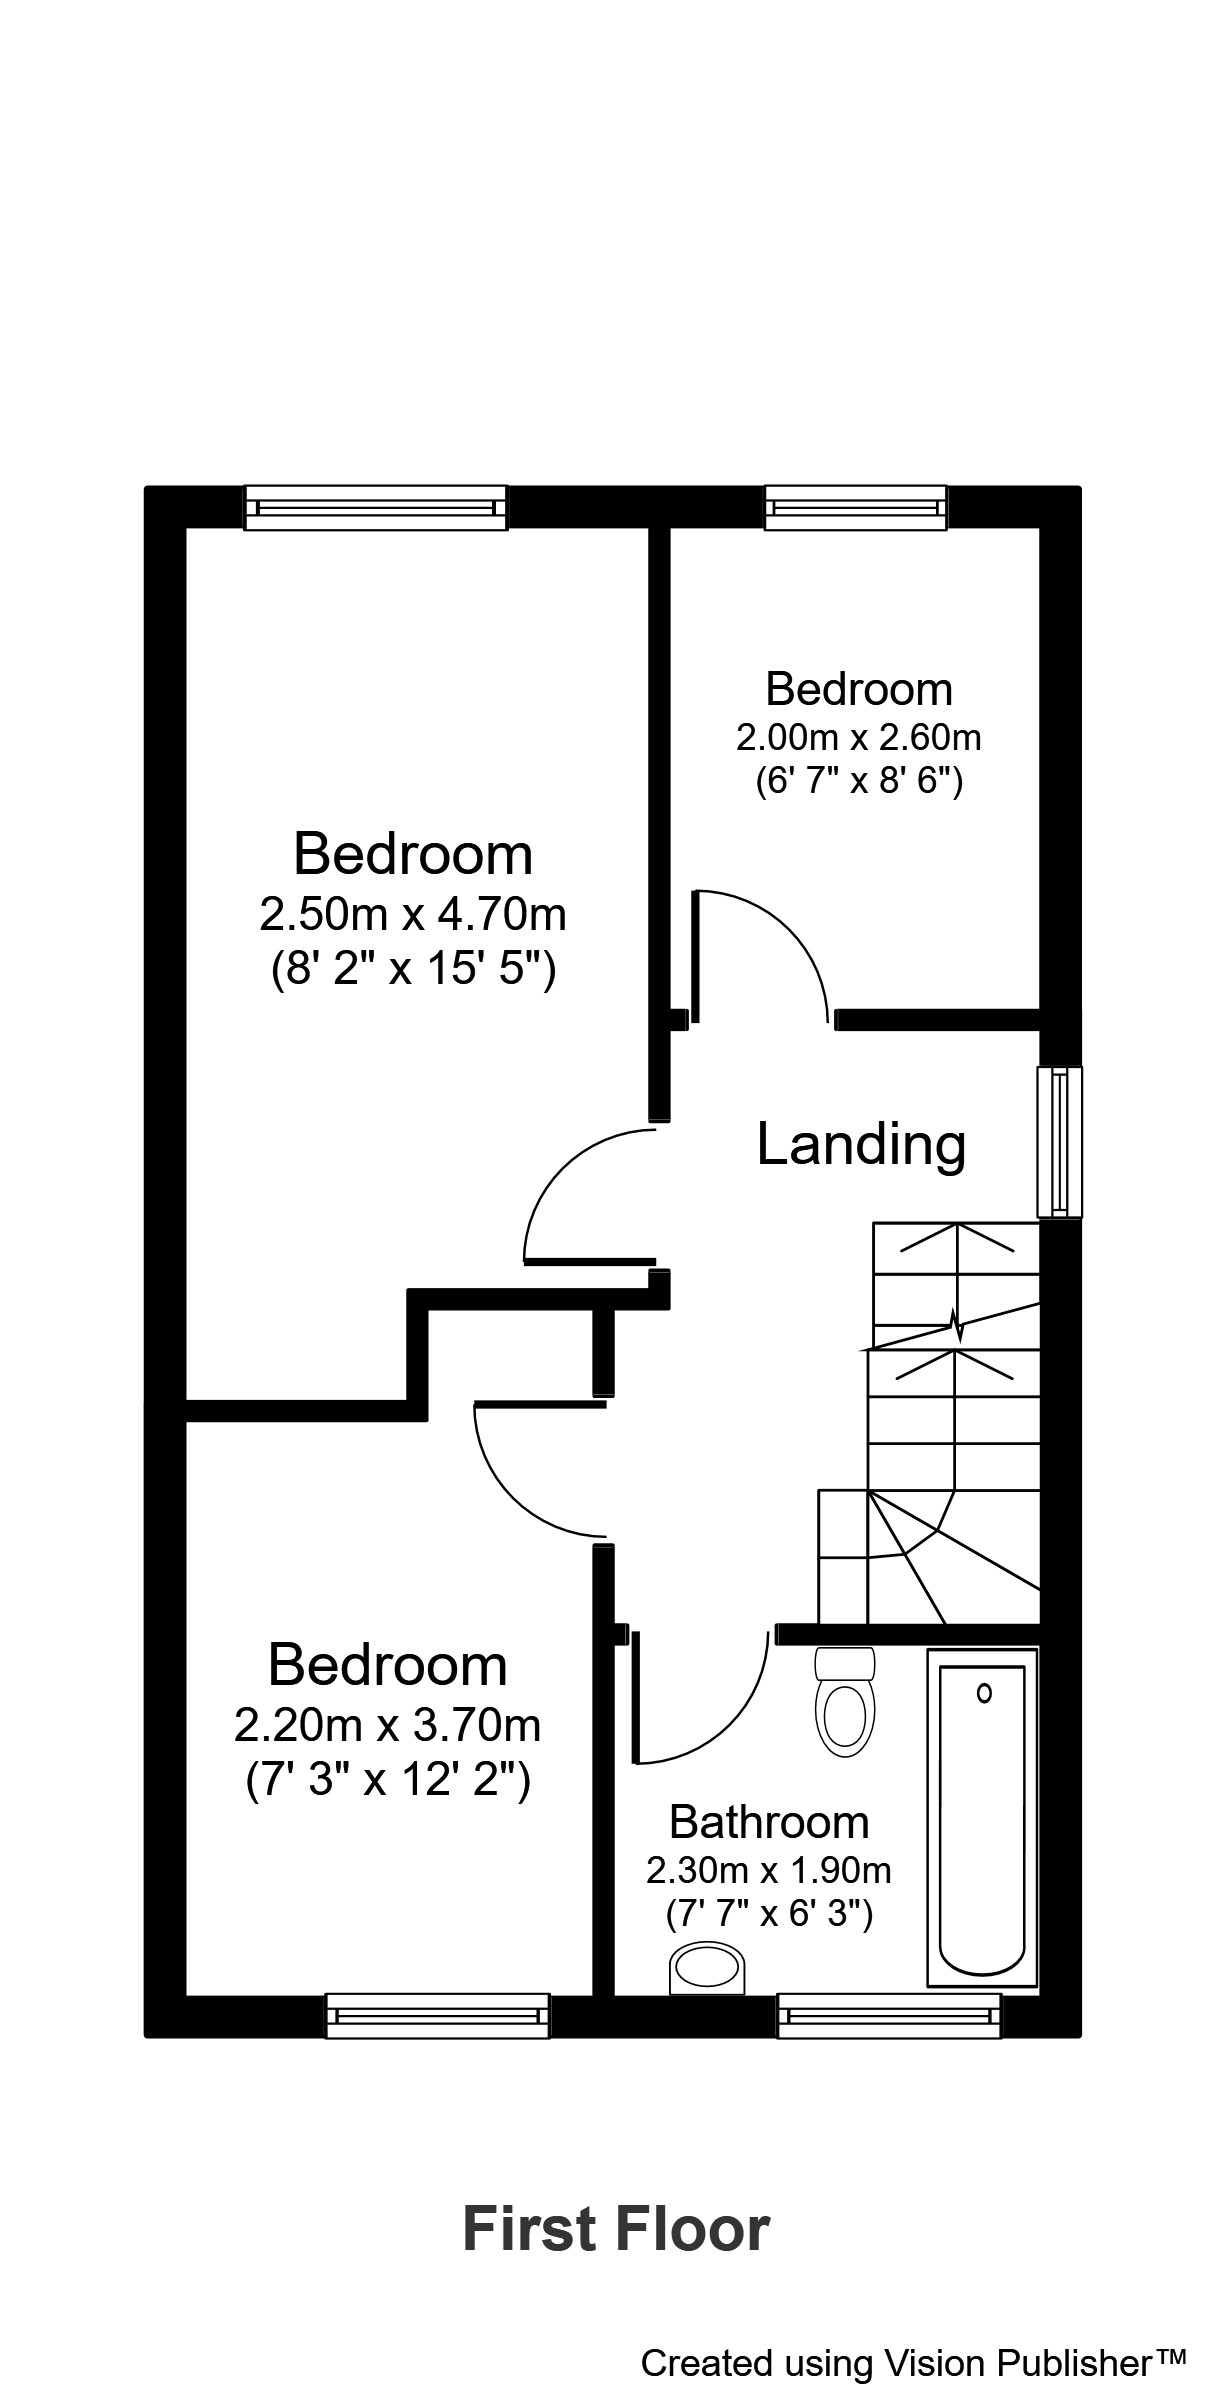 18 montrose 1st floor Floor Plans (Auto Sized) (2)